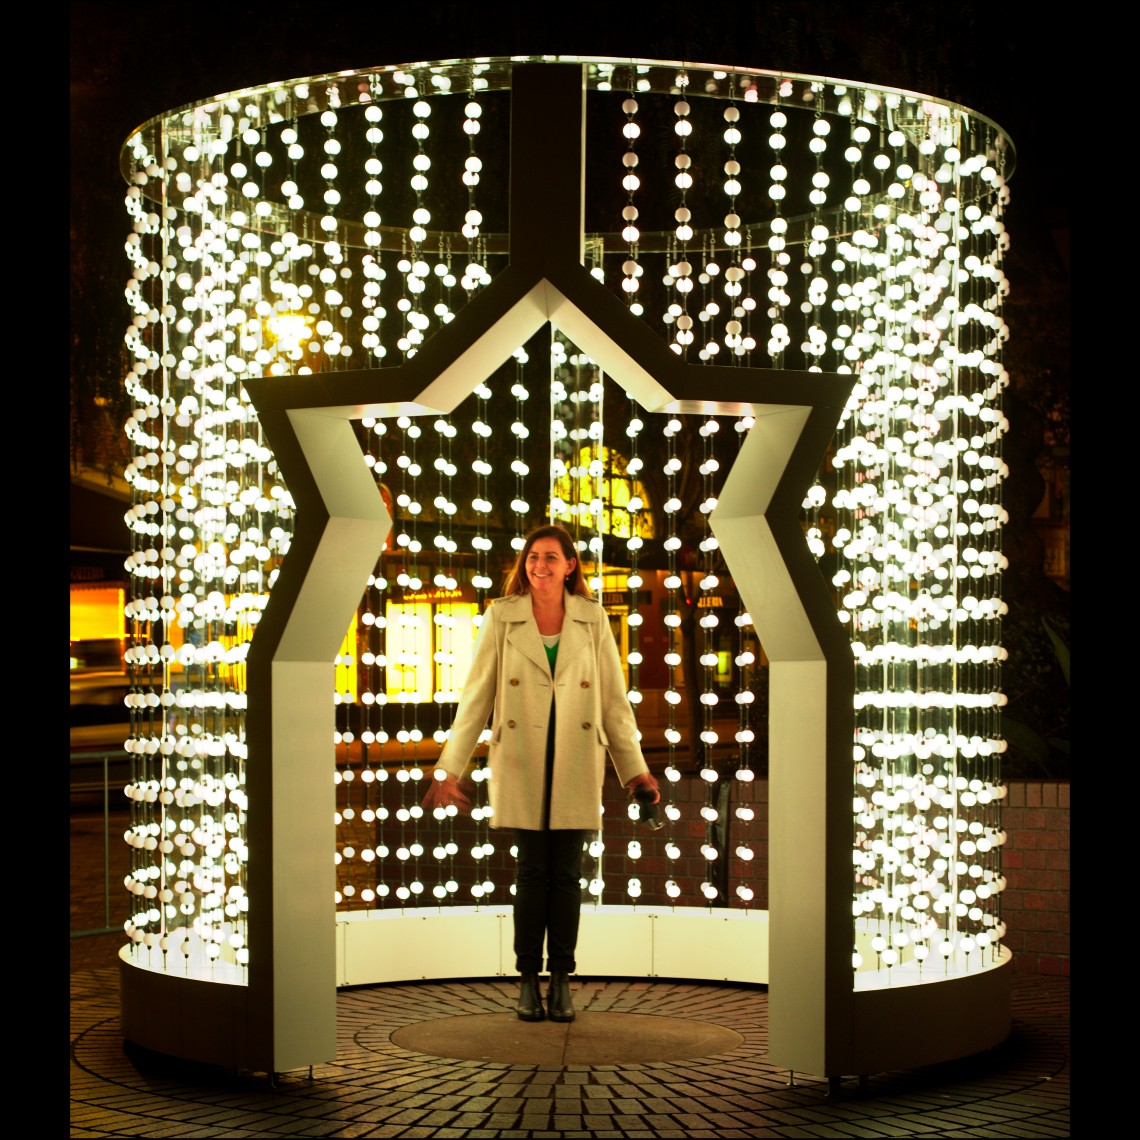 Space Folding light sculpture